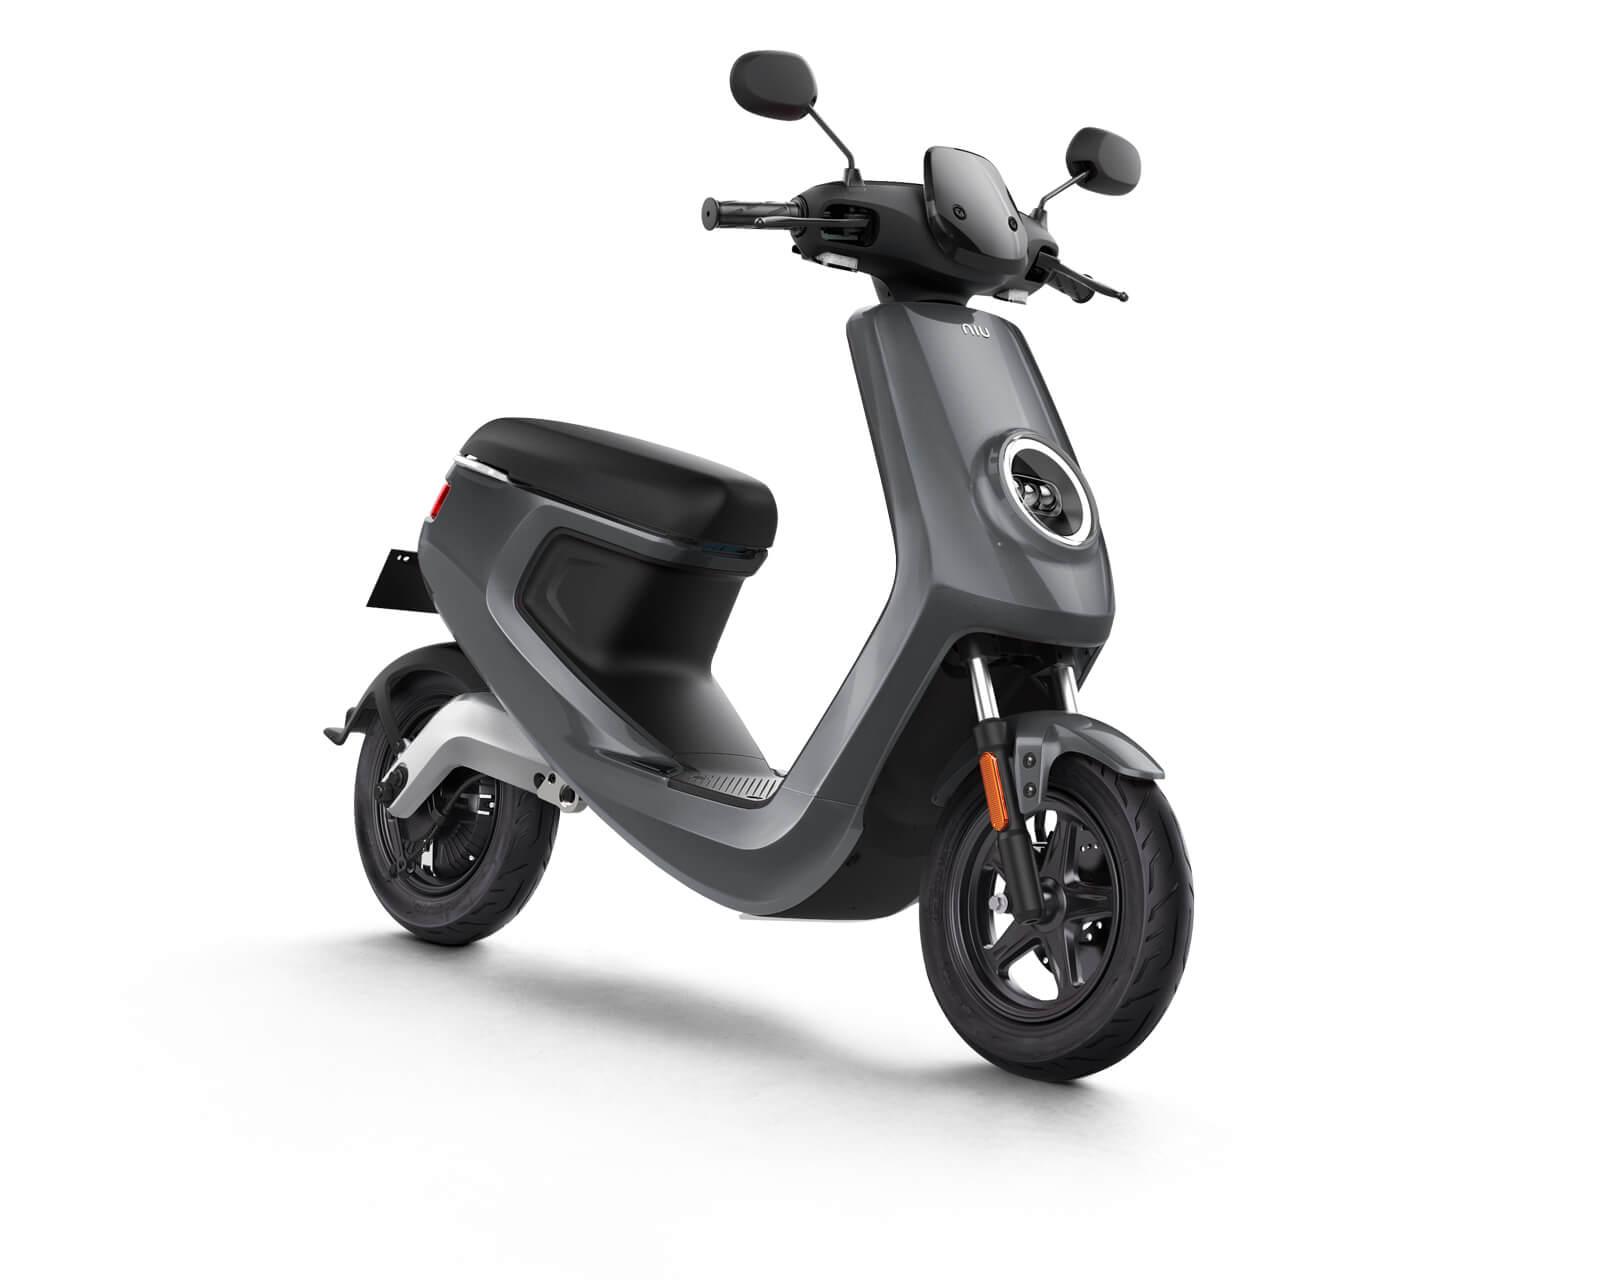 Paris achat e-scooter 50cc - niu-paris